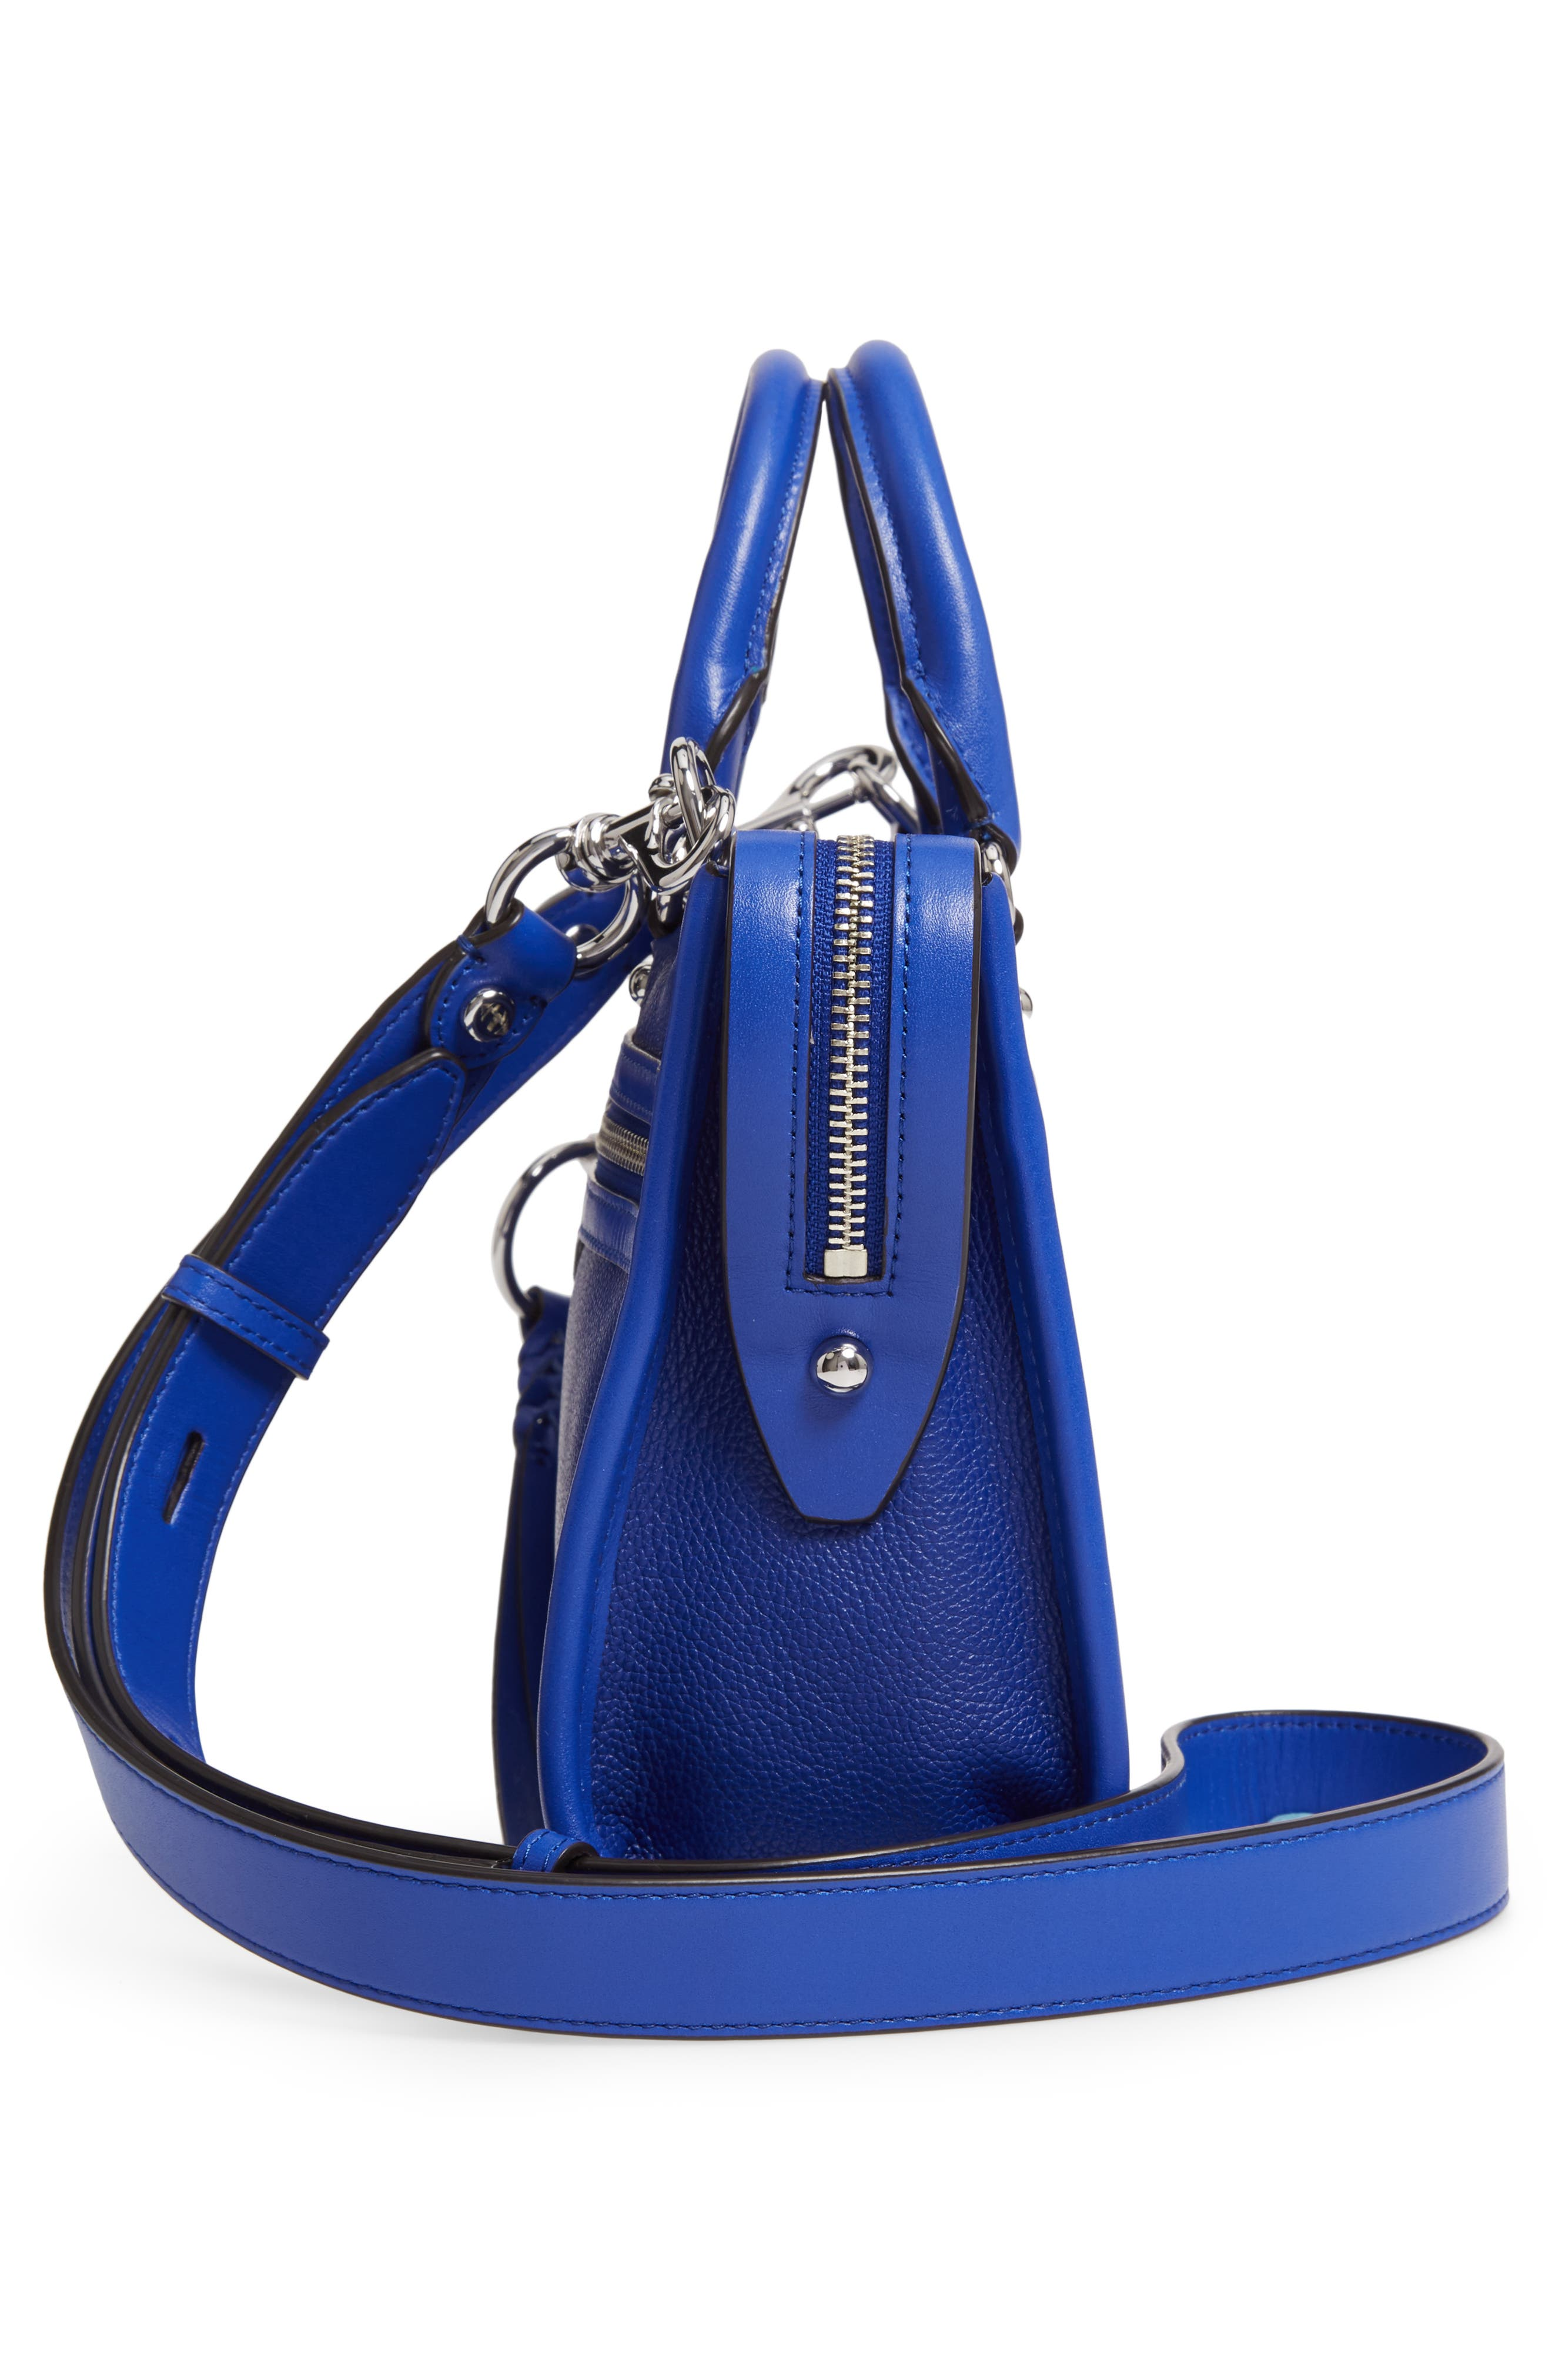 REBECCA MINKOFF, Micro Bedford Leather Satchel, Alternate thumbnail 6, color, BRIGHT BLUE